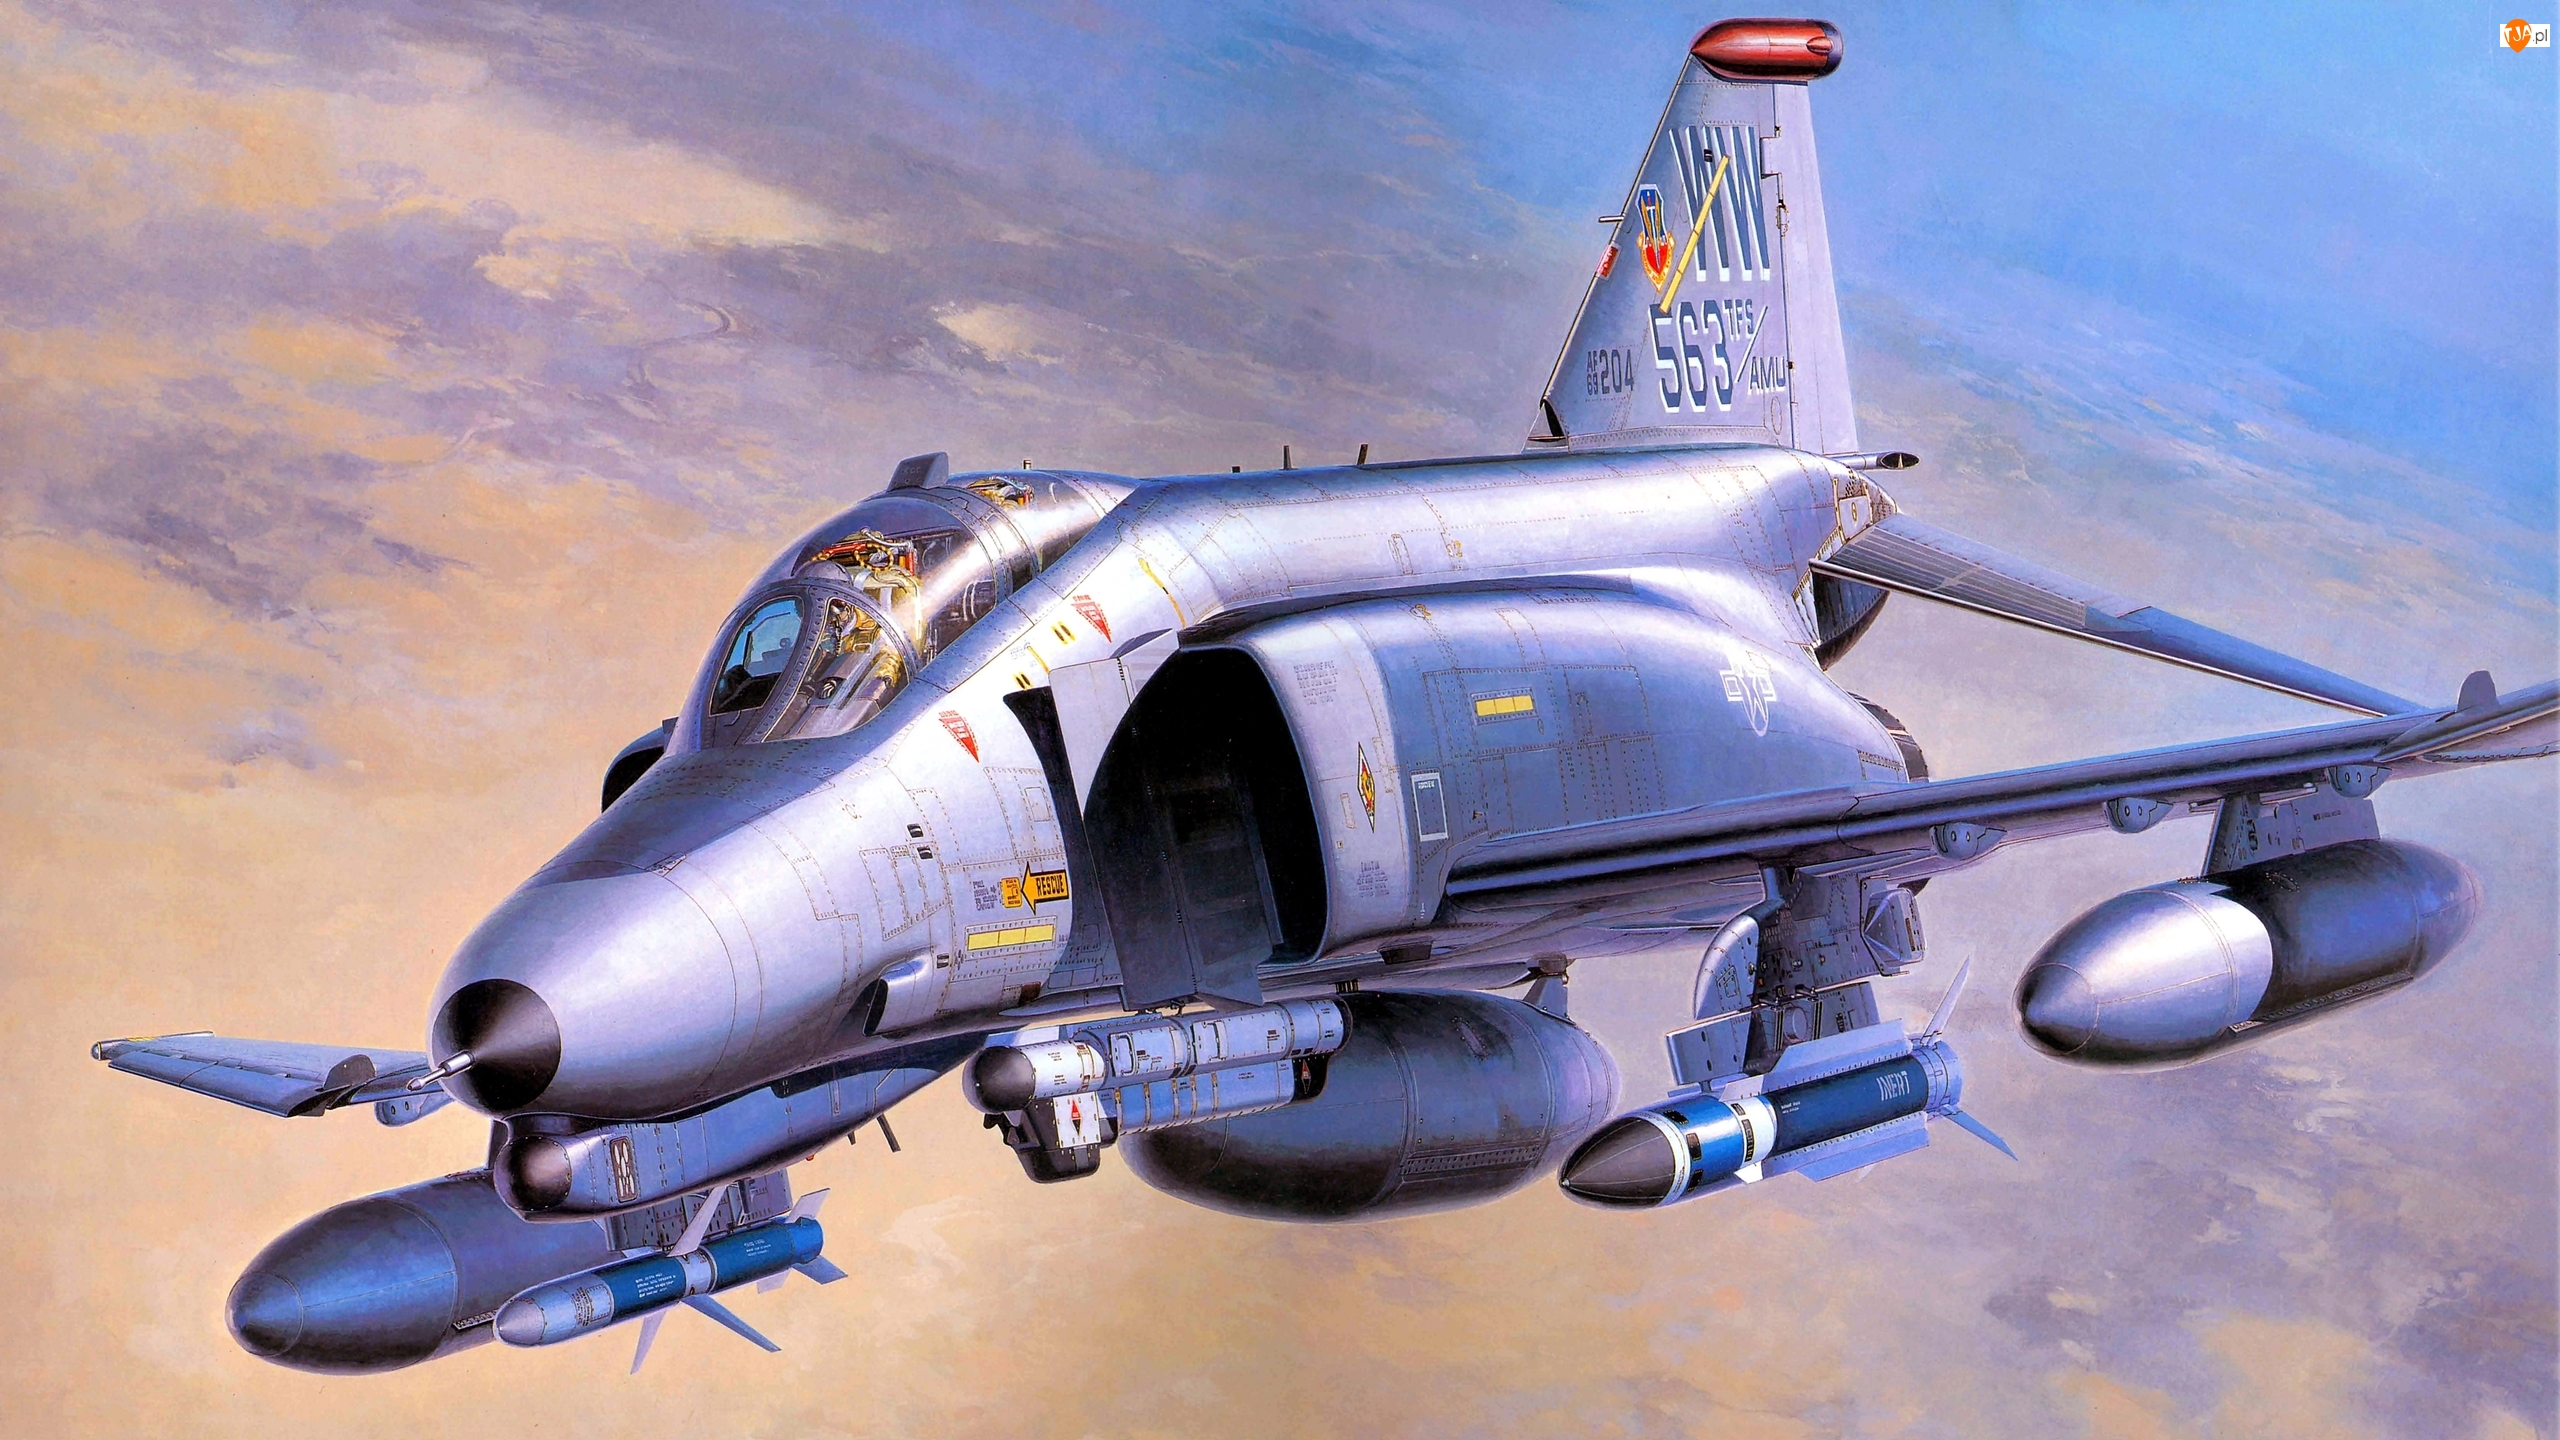 Wild Weasel, Samolot, McDonnell Douglas F-4G Phantom II